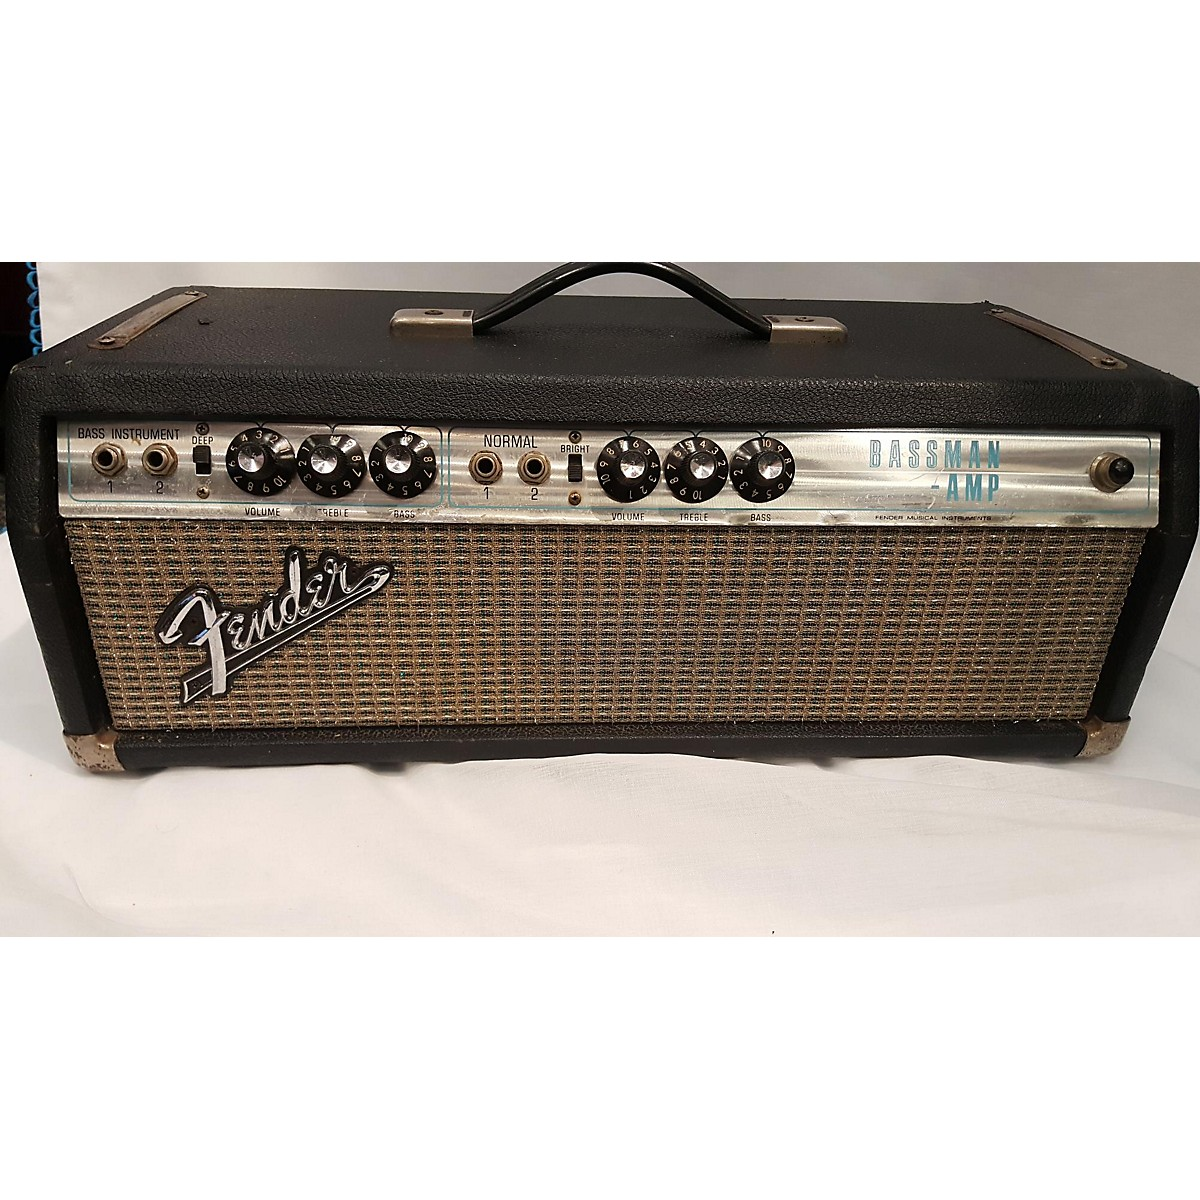 Fender 1970s Bassman Amp Tube Guitar Amp Head